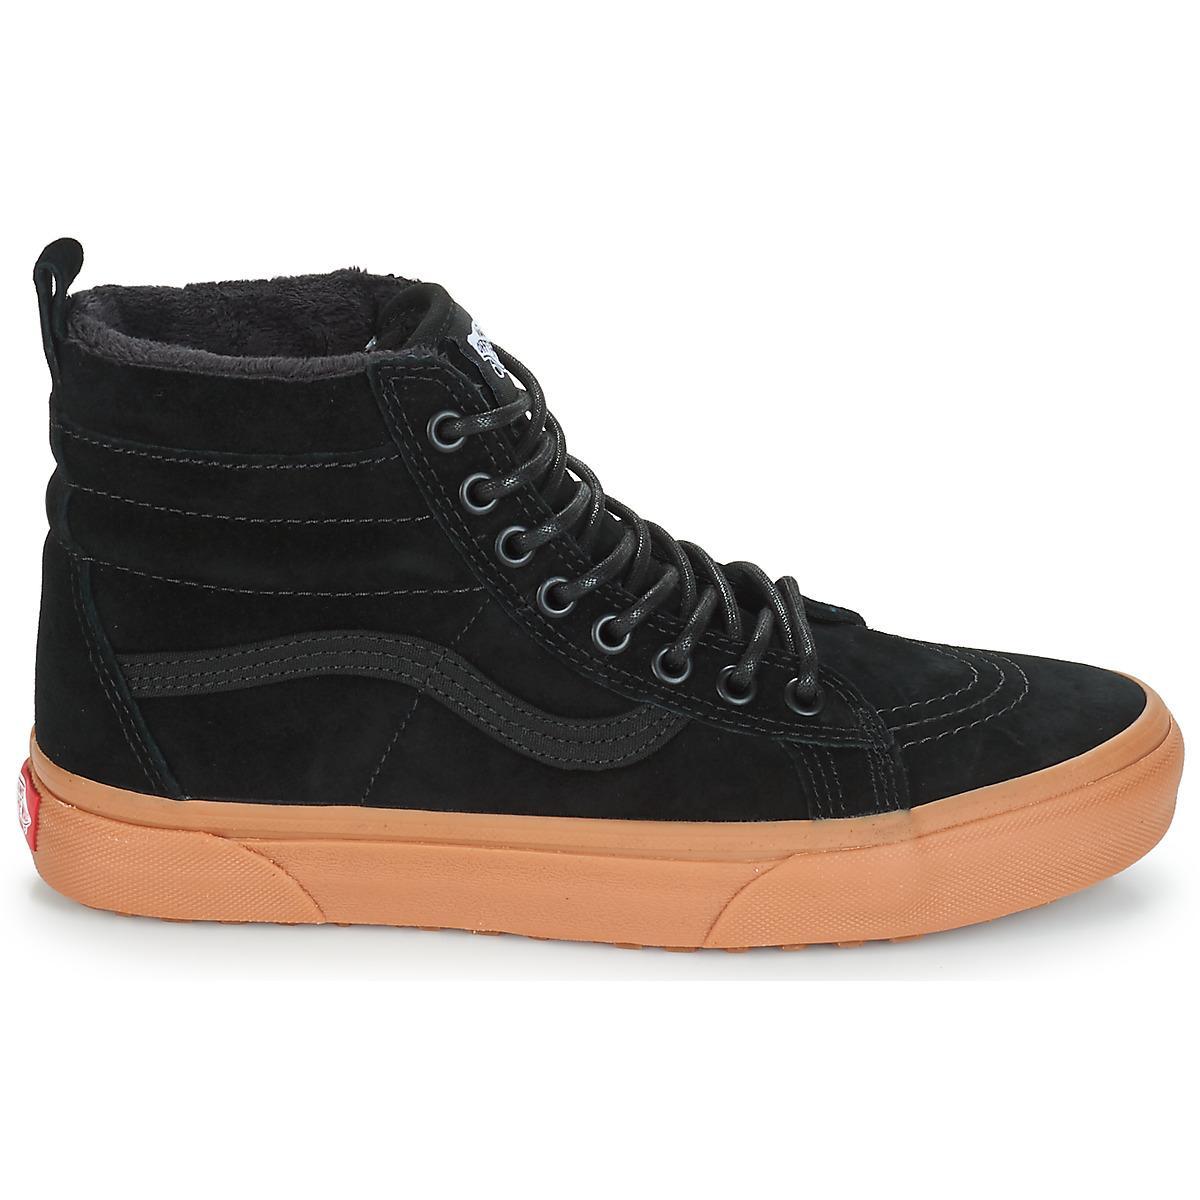 Vans - Black Sk8-hi Mte Shoes (high-top Trainers) - Lyst. View fullscreen 027862edf